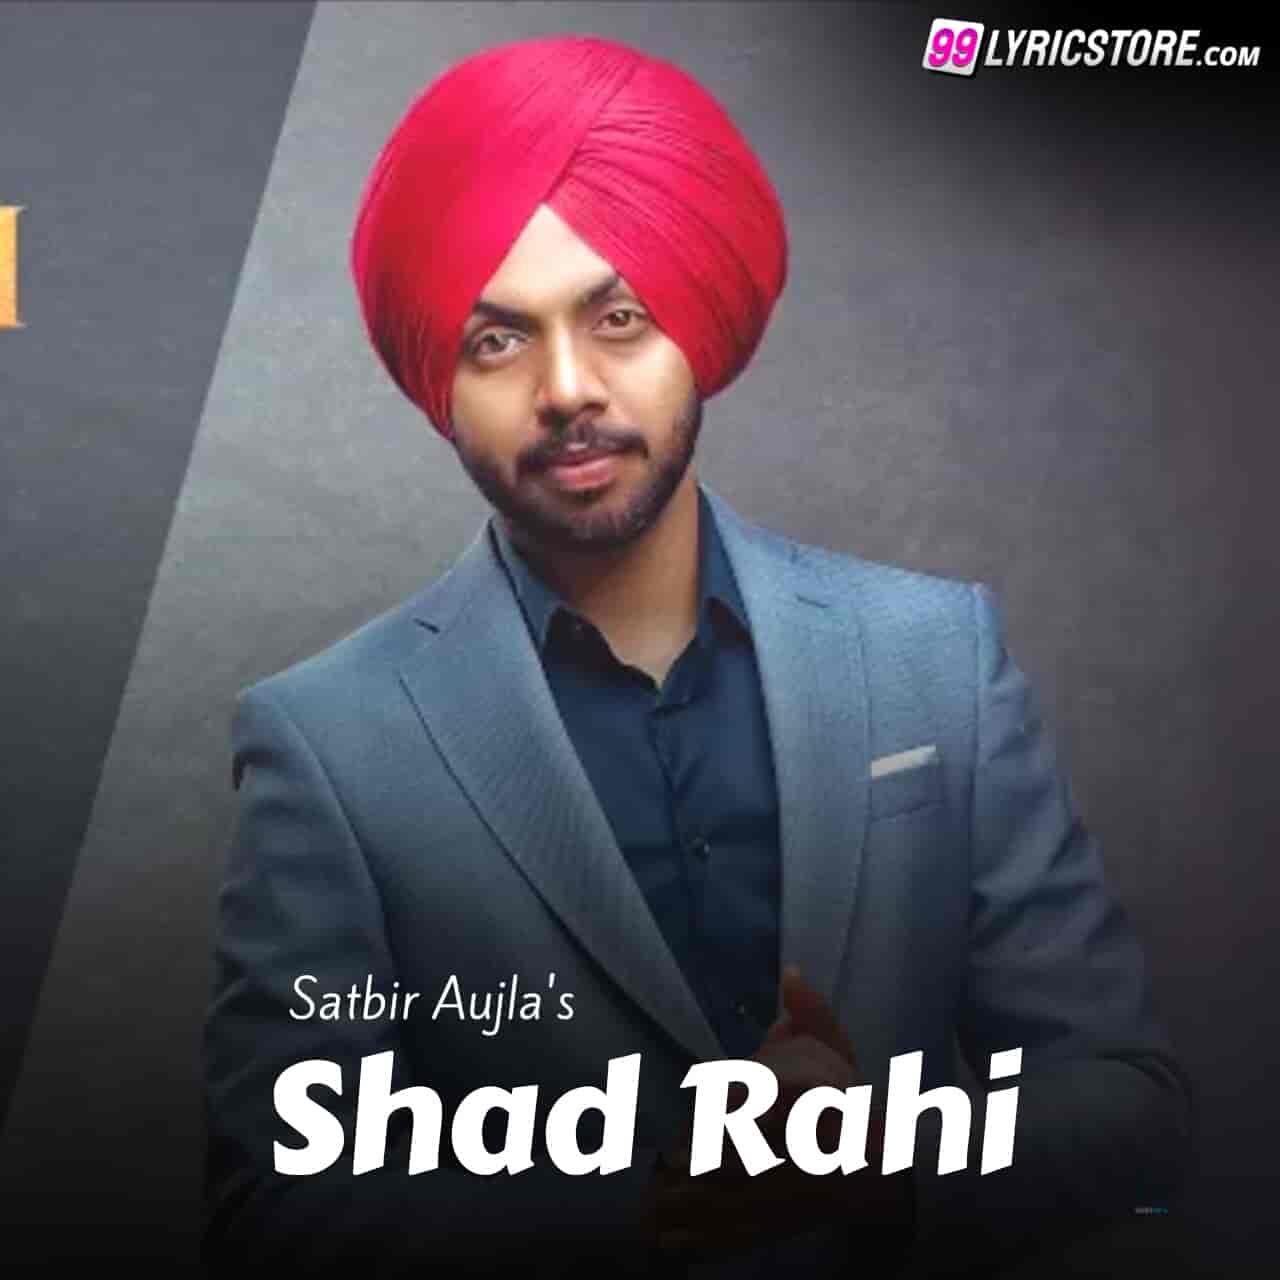 Shad Rahi Punjabi Song Lyrics Sung by Satbir Aujla